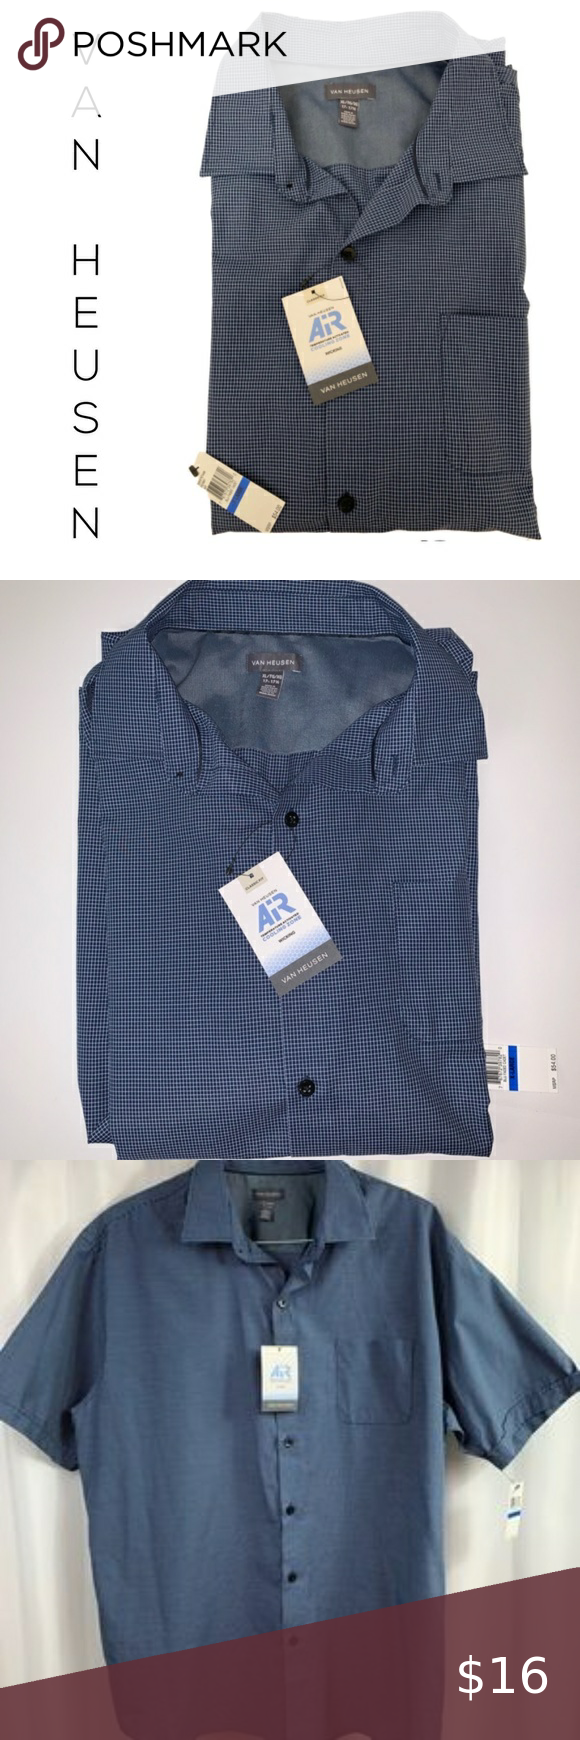 Men S Van Heusen Short Sleeve Shirt Xl Nwt In 2020 Colorful Shirts Casual Shirts For Men Clothes Design